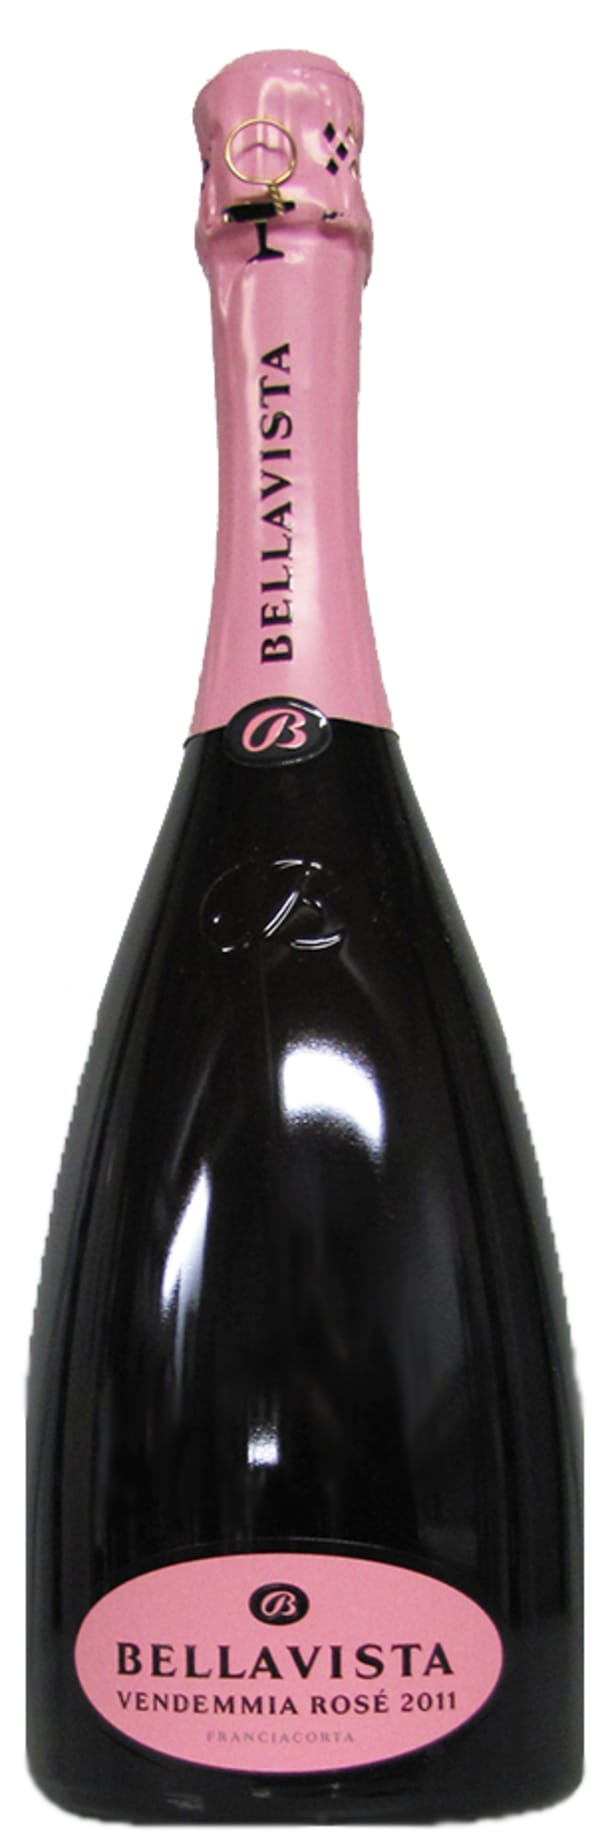 Bellavista Rosé Brut 2011